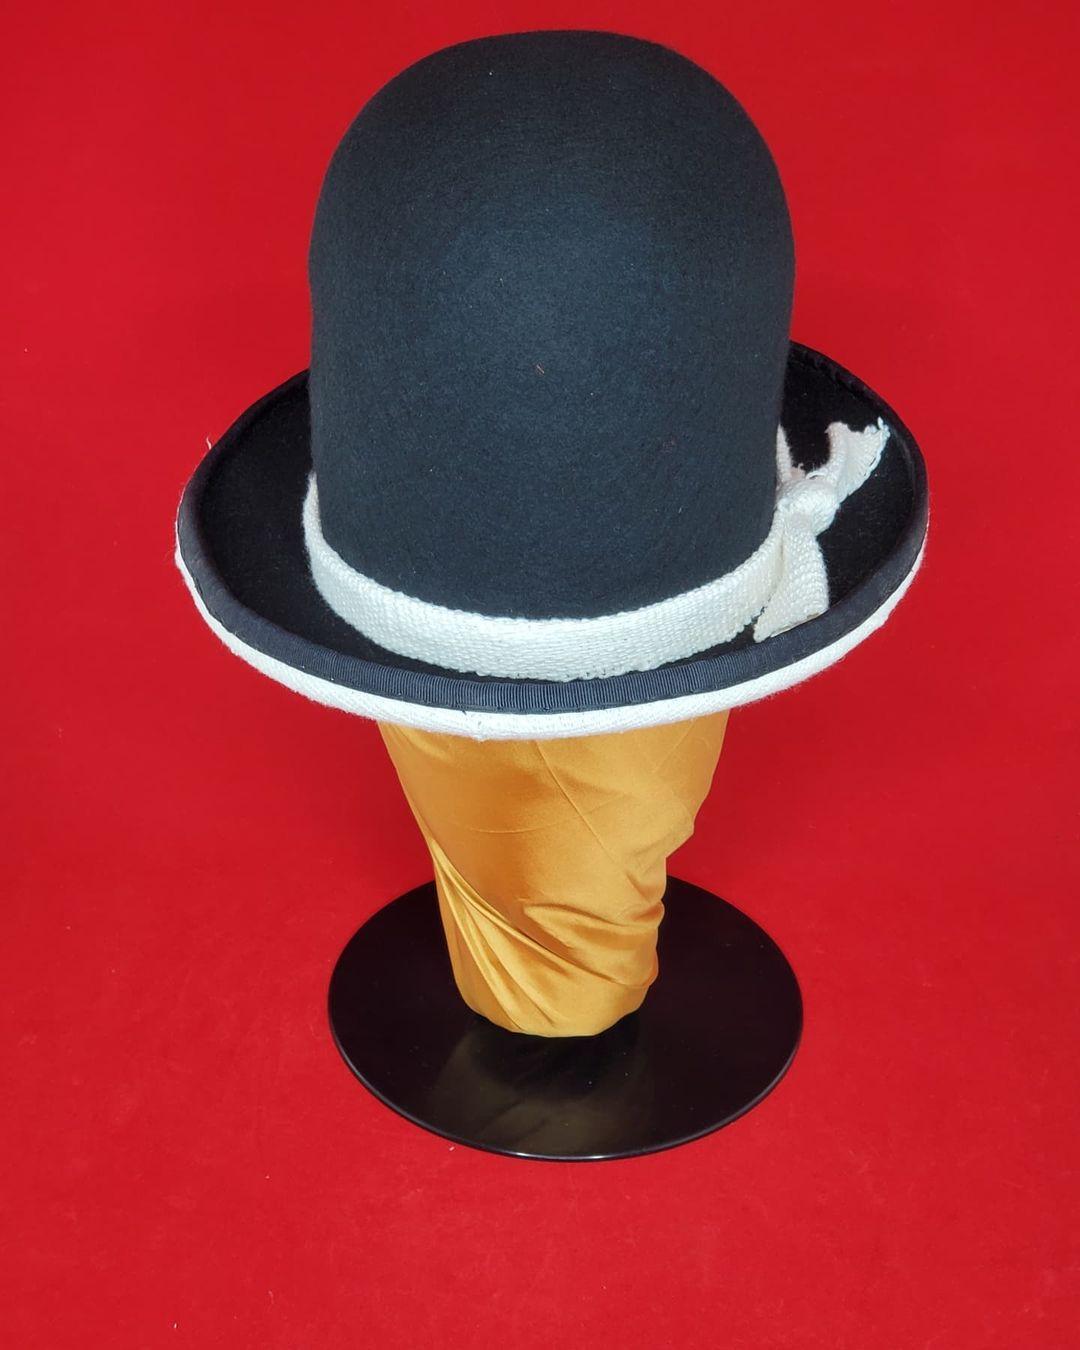 Den sorte hatter. Rockers Uptown Bowler. Uldfilt med en afrikansk mudderklud ...